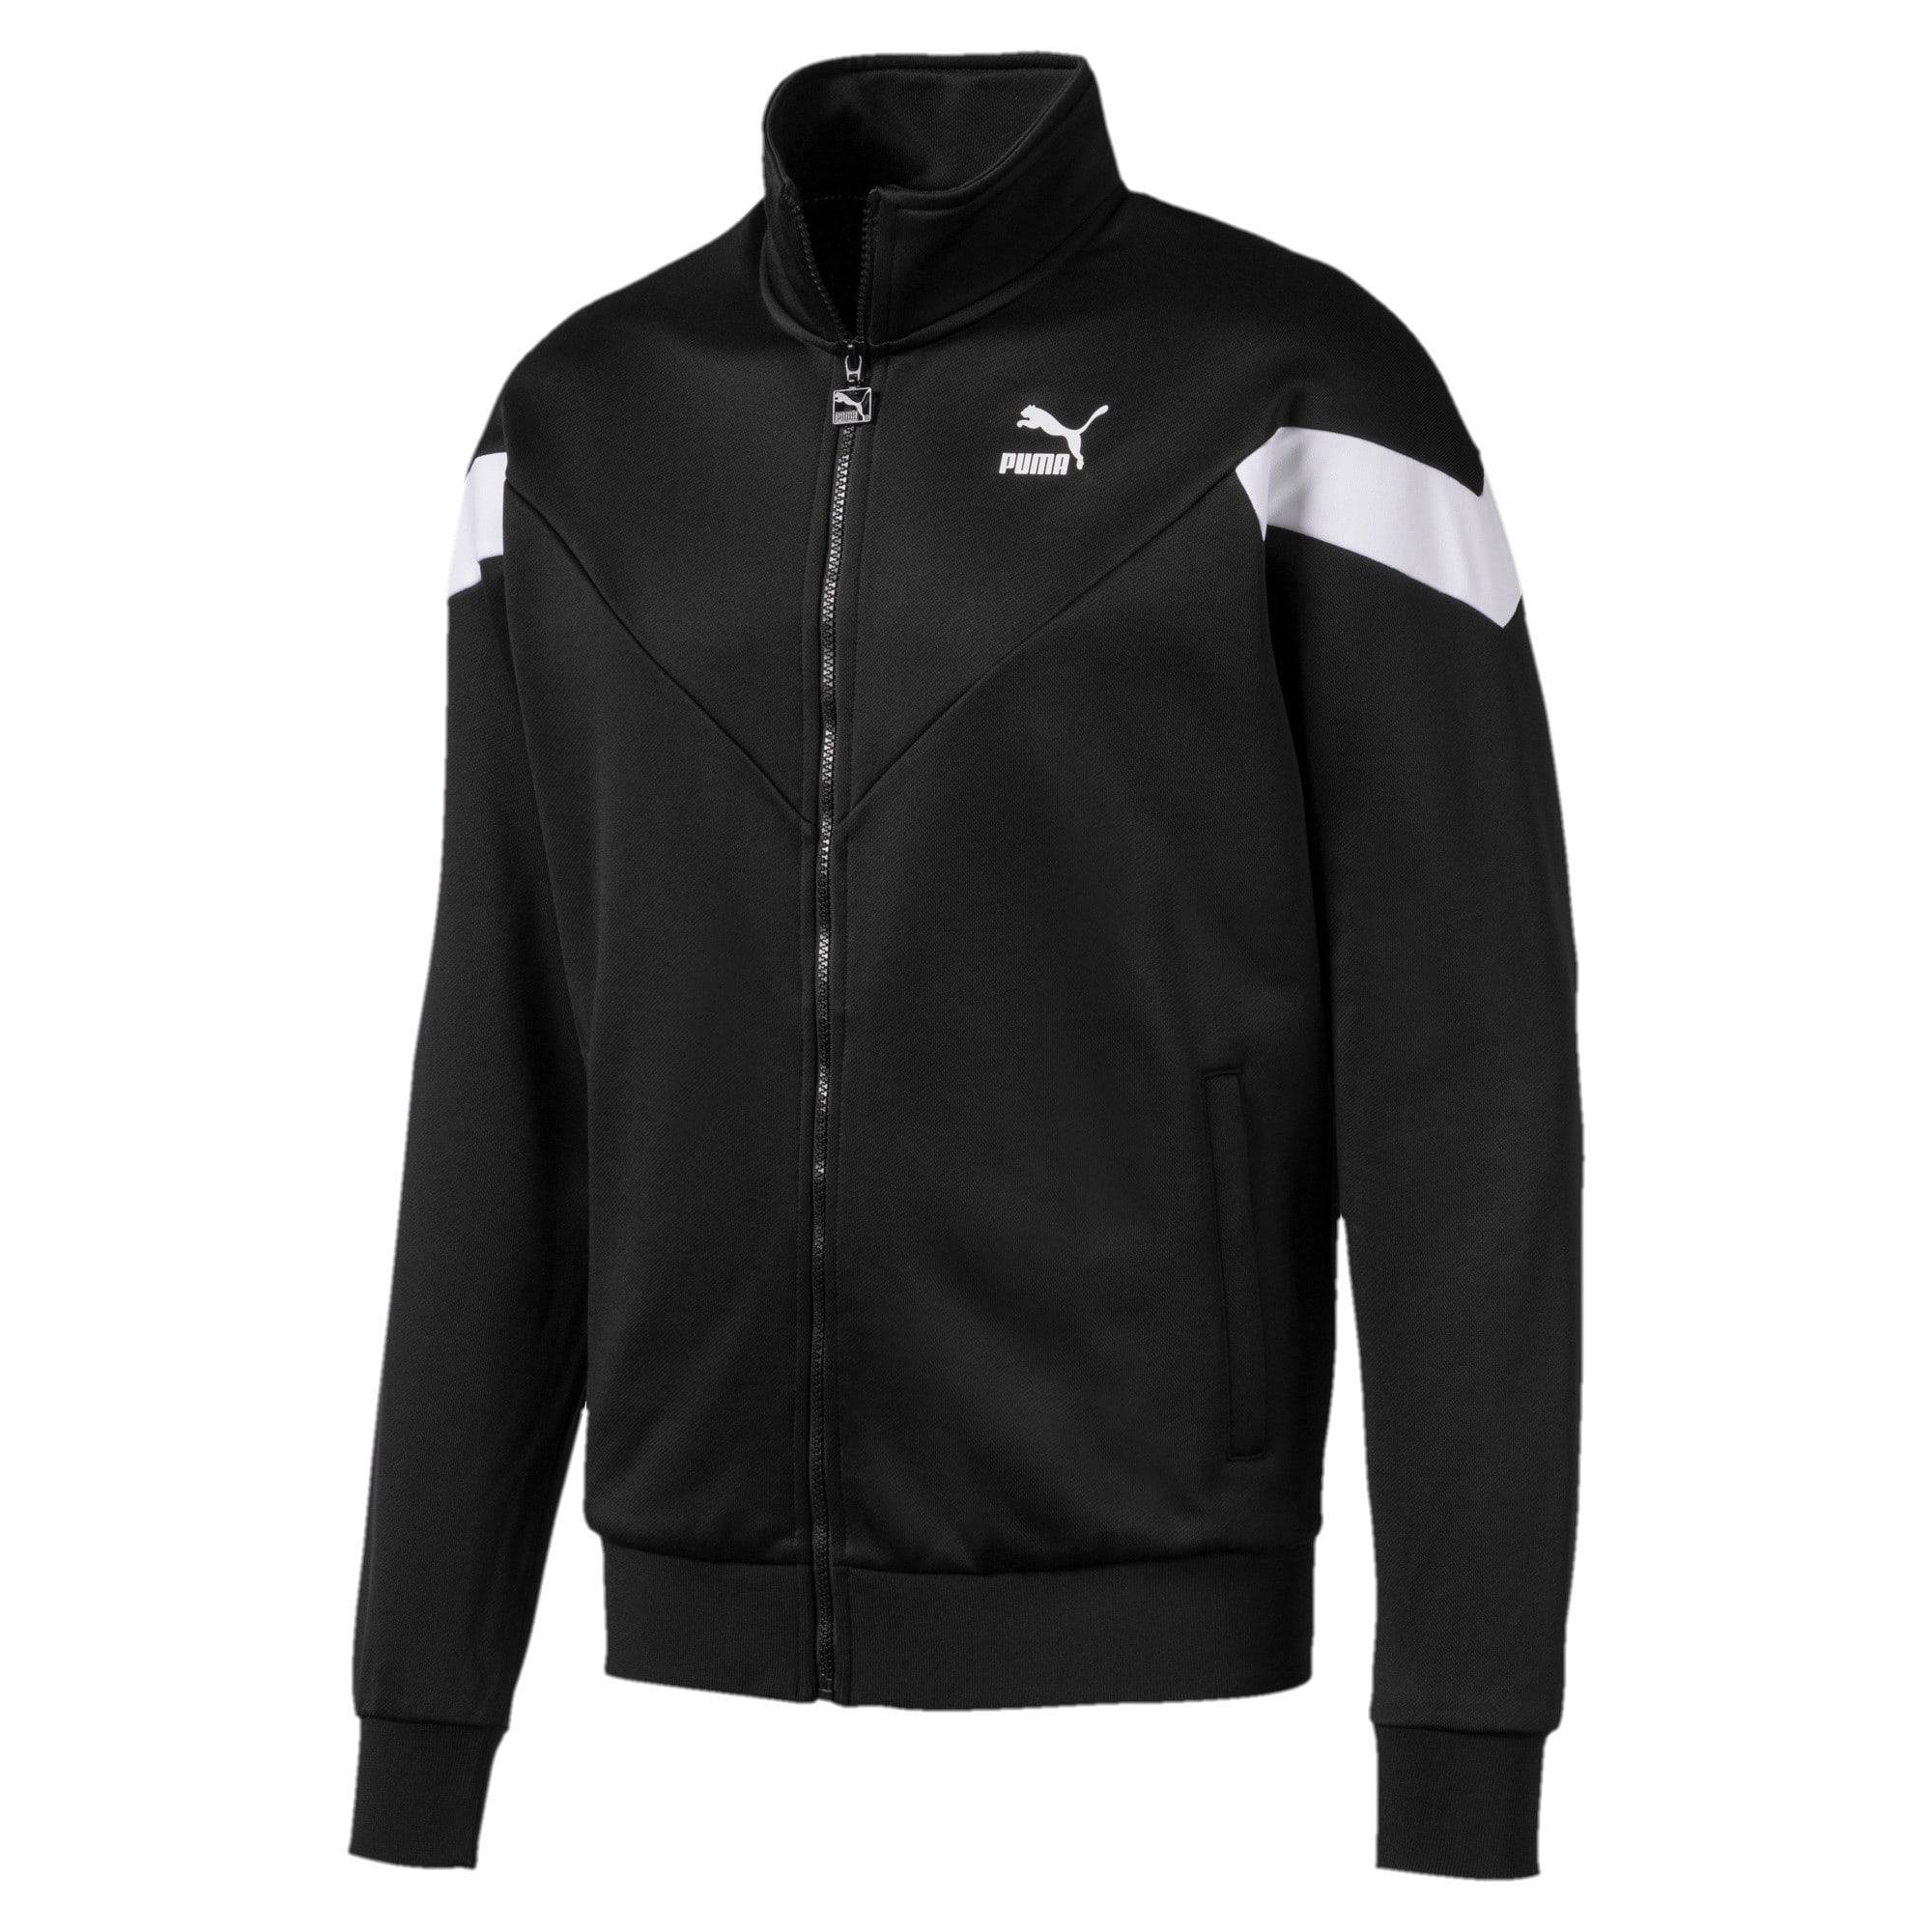 Thumbnail 1 of Iconic MCS Men's Track Jacket, Puma Black, medium